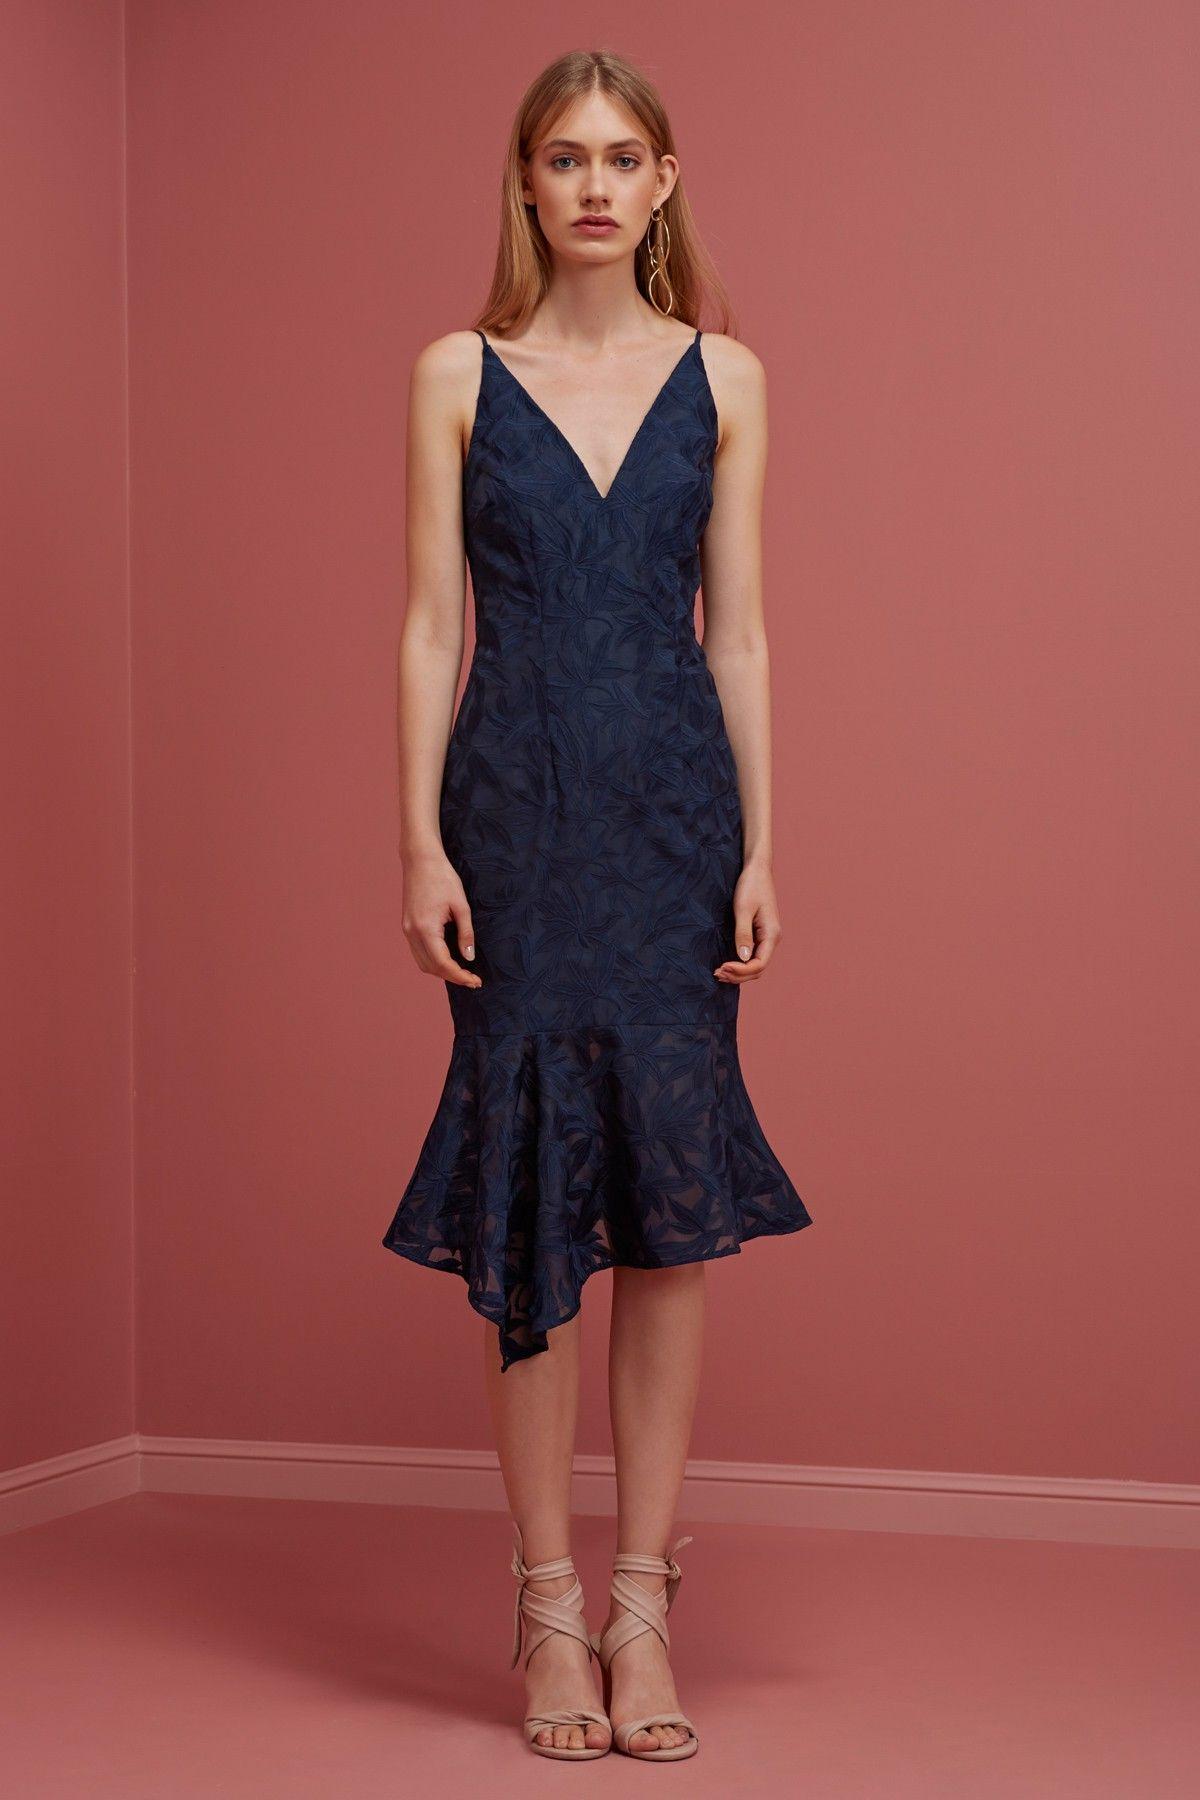 Plain sight dress semi formal wear spring racing and wedding blue